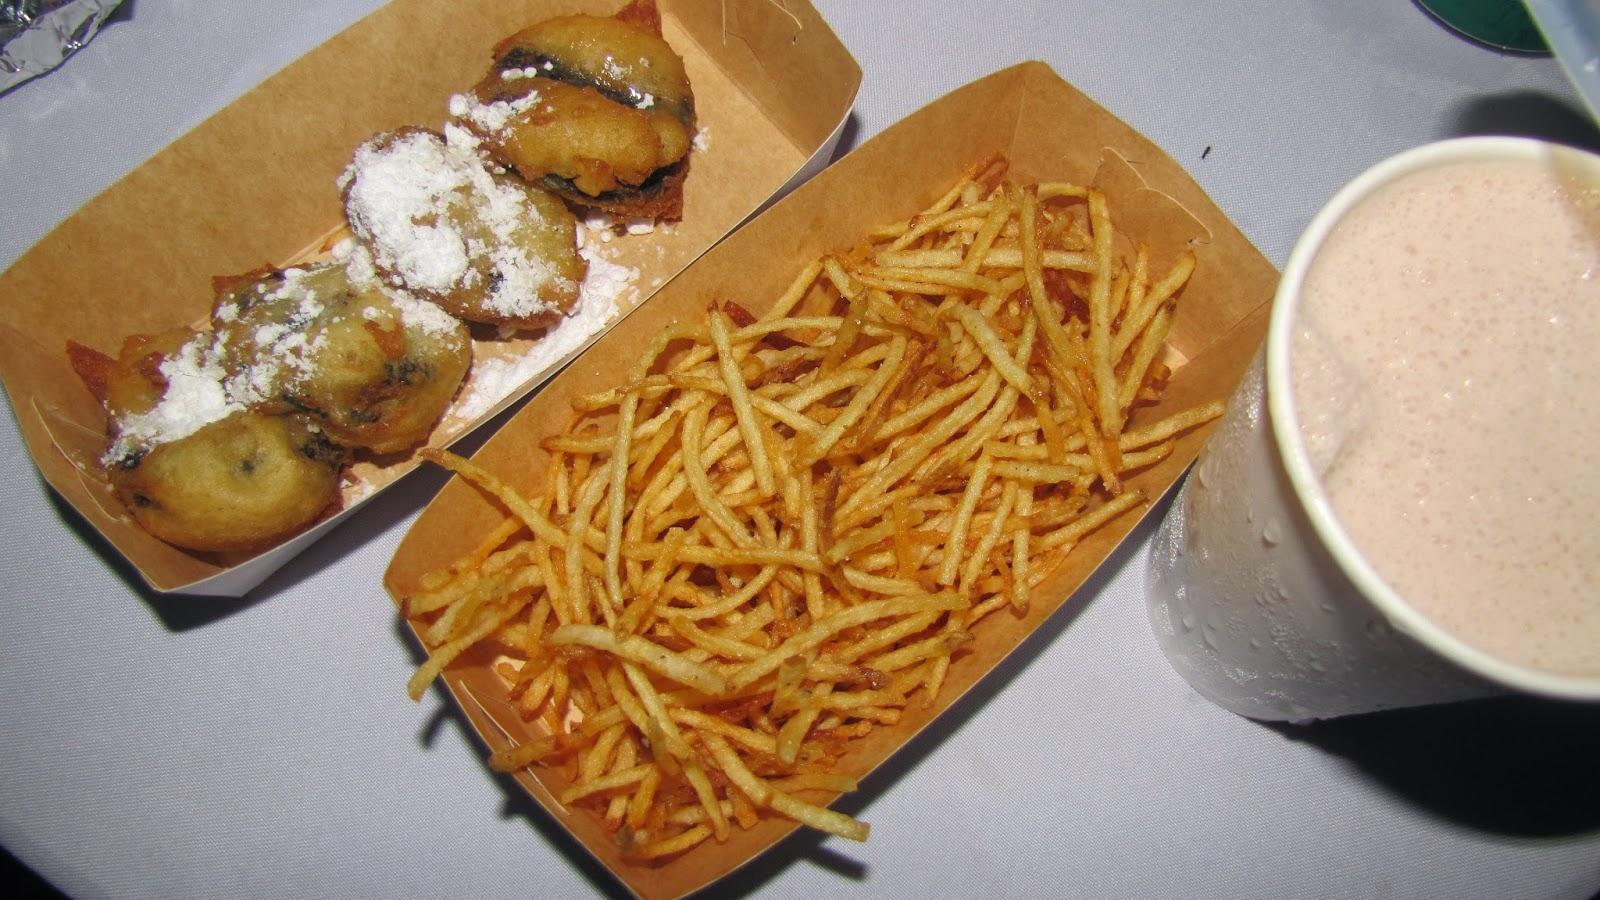 #032eatdrink, food, cebu, cebu food truck, burger, food